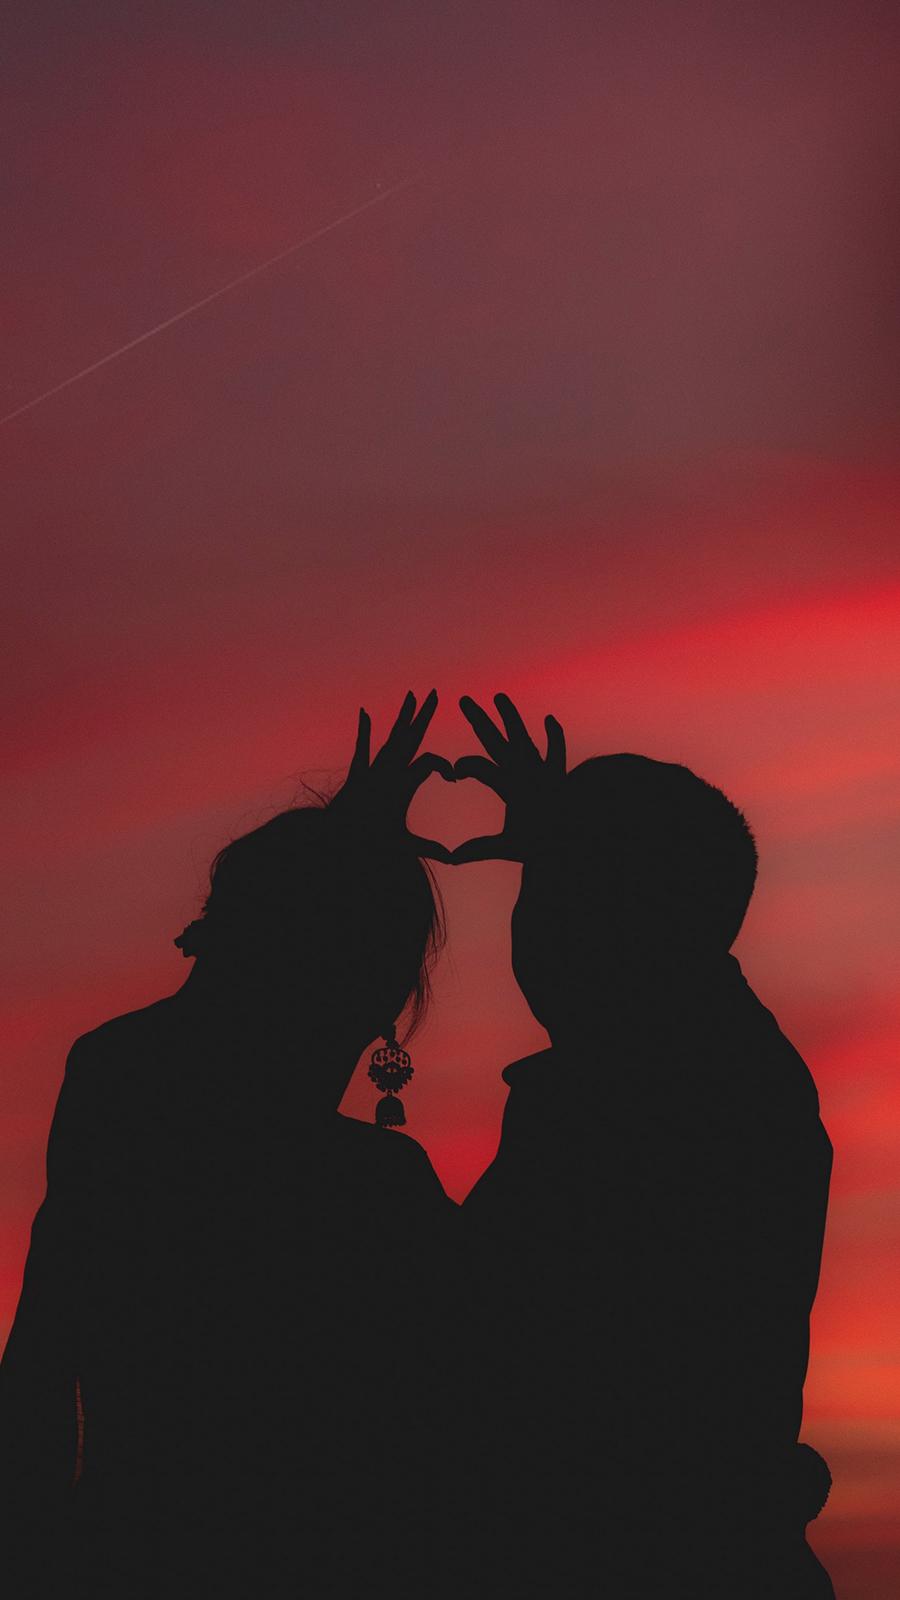 Woman & Man Love Wallpapers Free Download